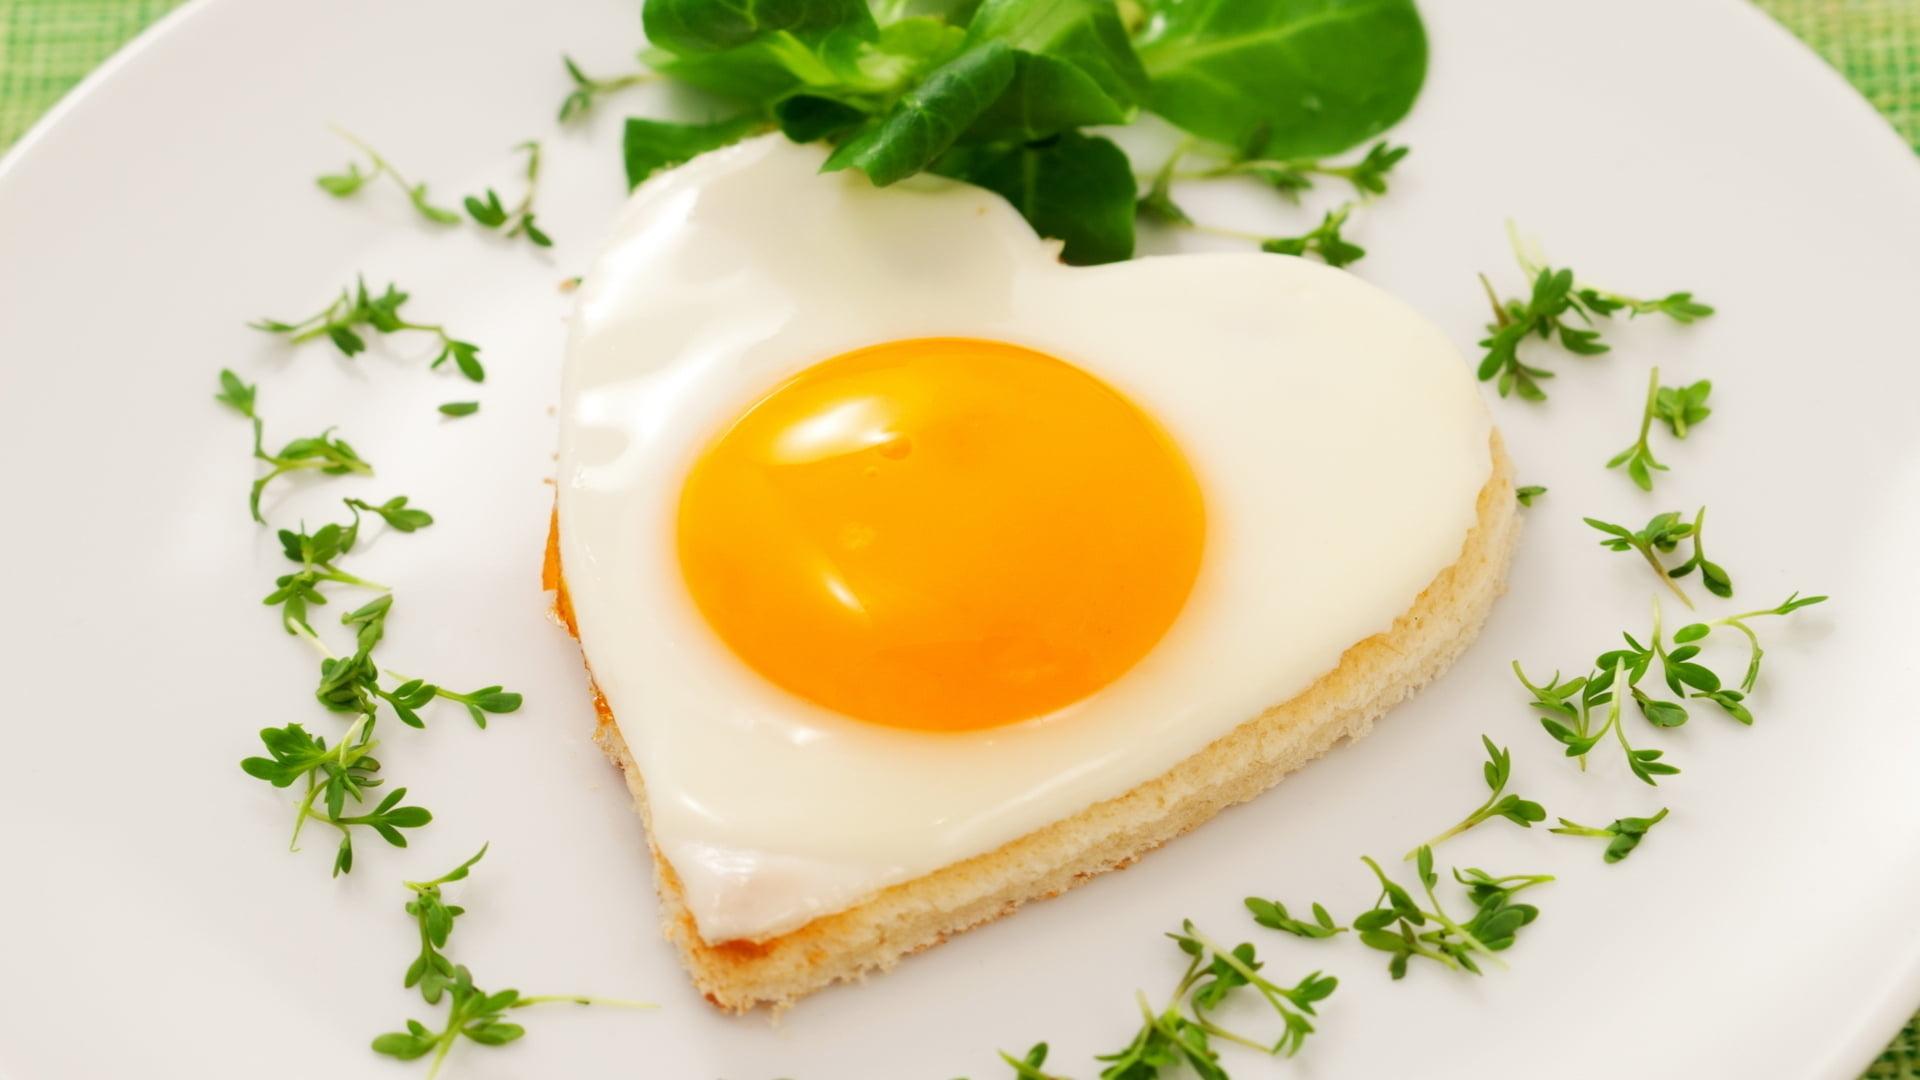 Heart shaped sunny side-up egg on bread HD wallpaper   Wallpaper Flare